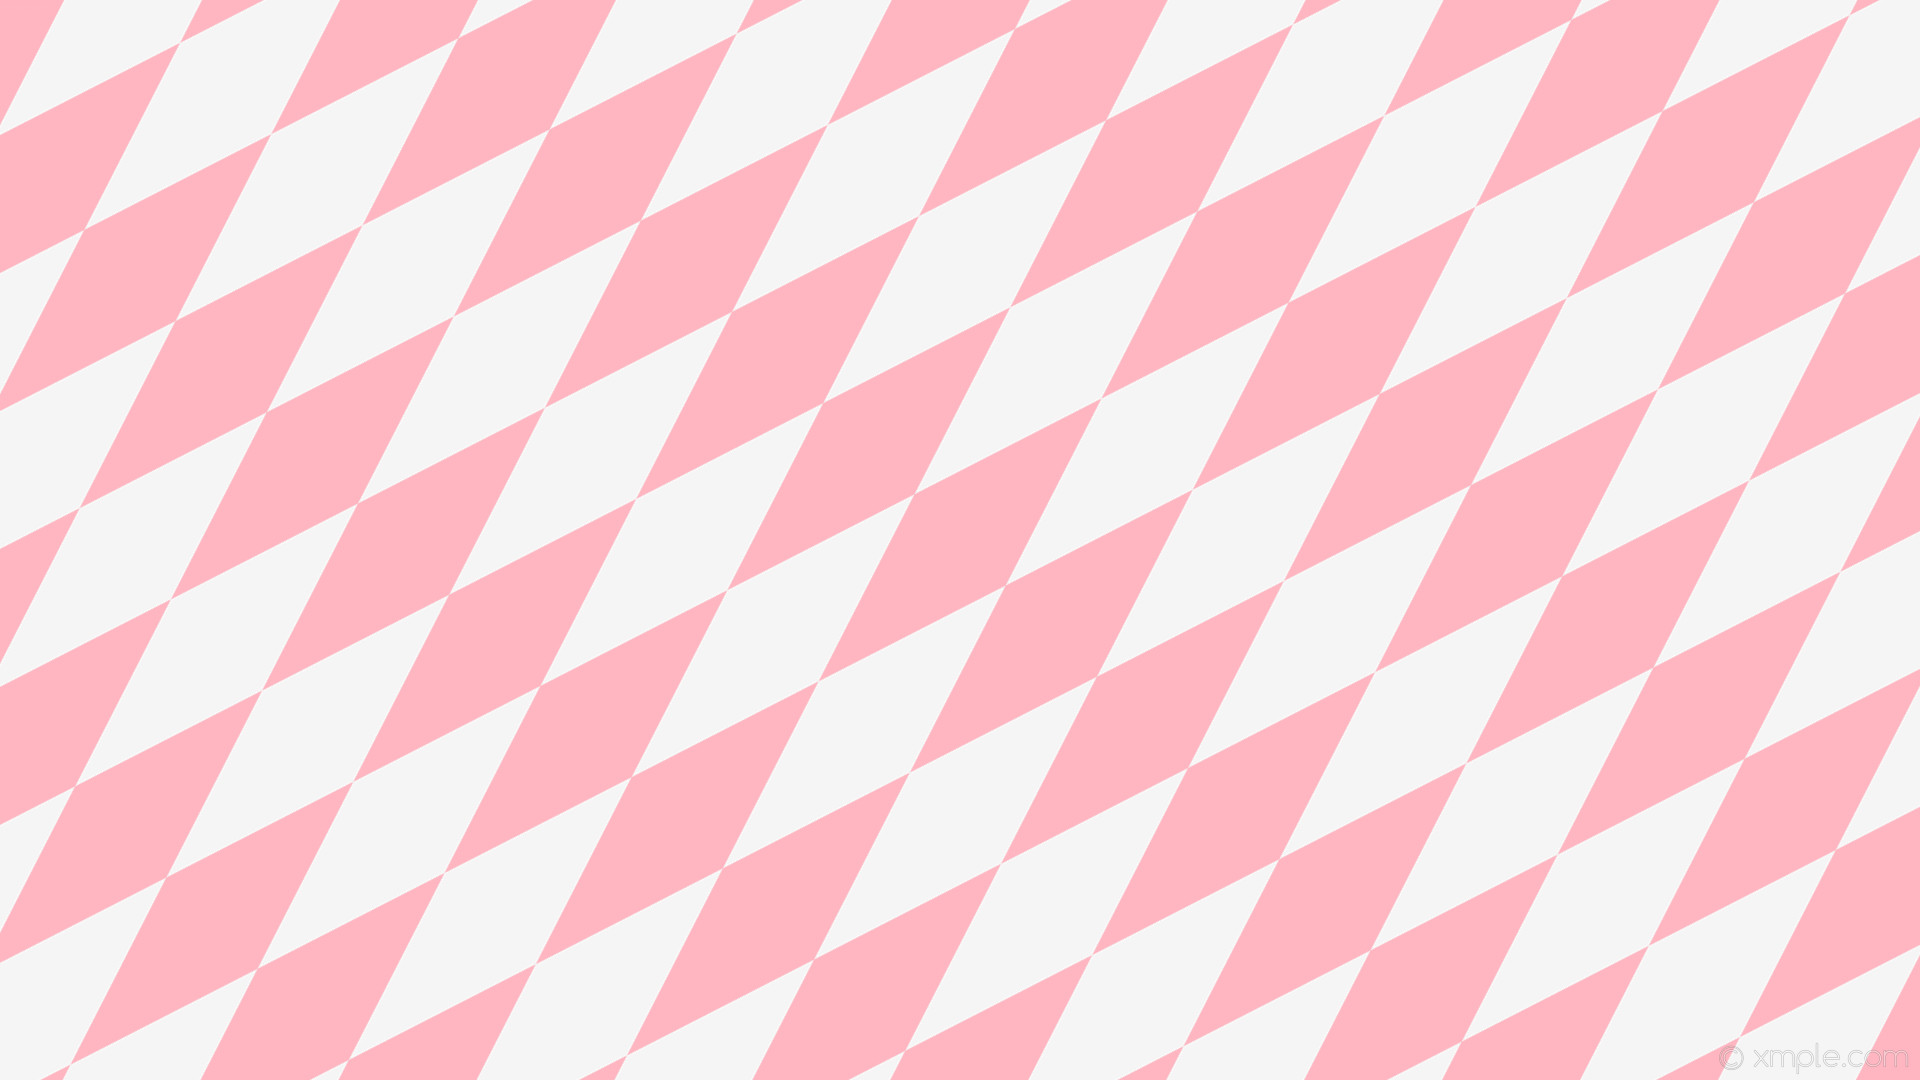 Res: 1920x1080, Good Wallpaper Diamond Light Pink - rhombus-pink-diamond-white-lozenge-